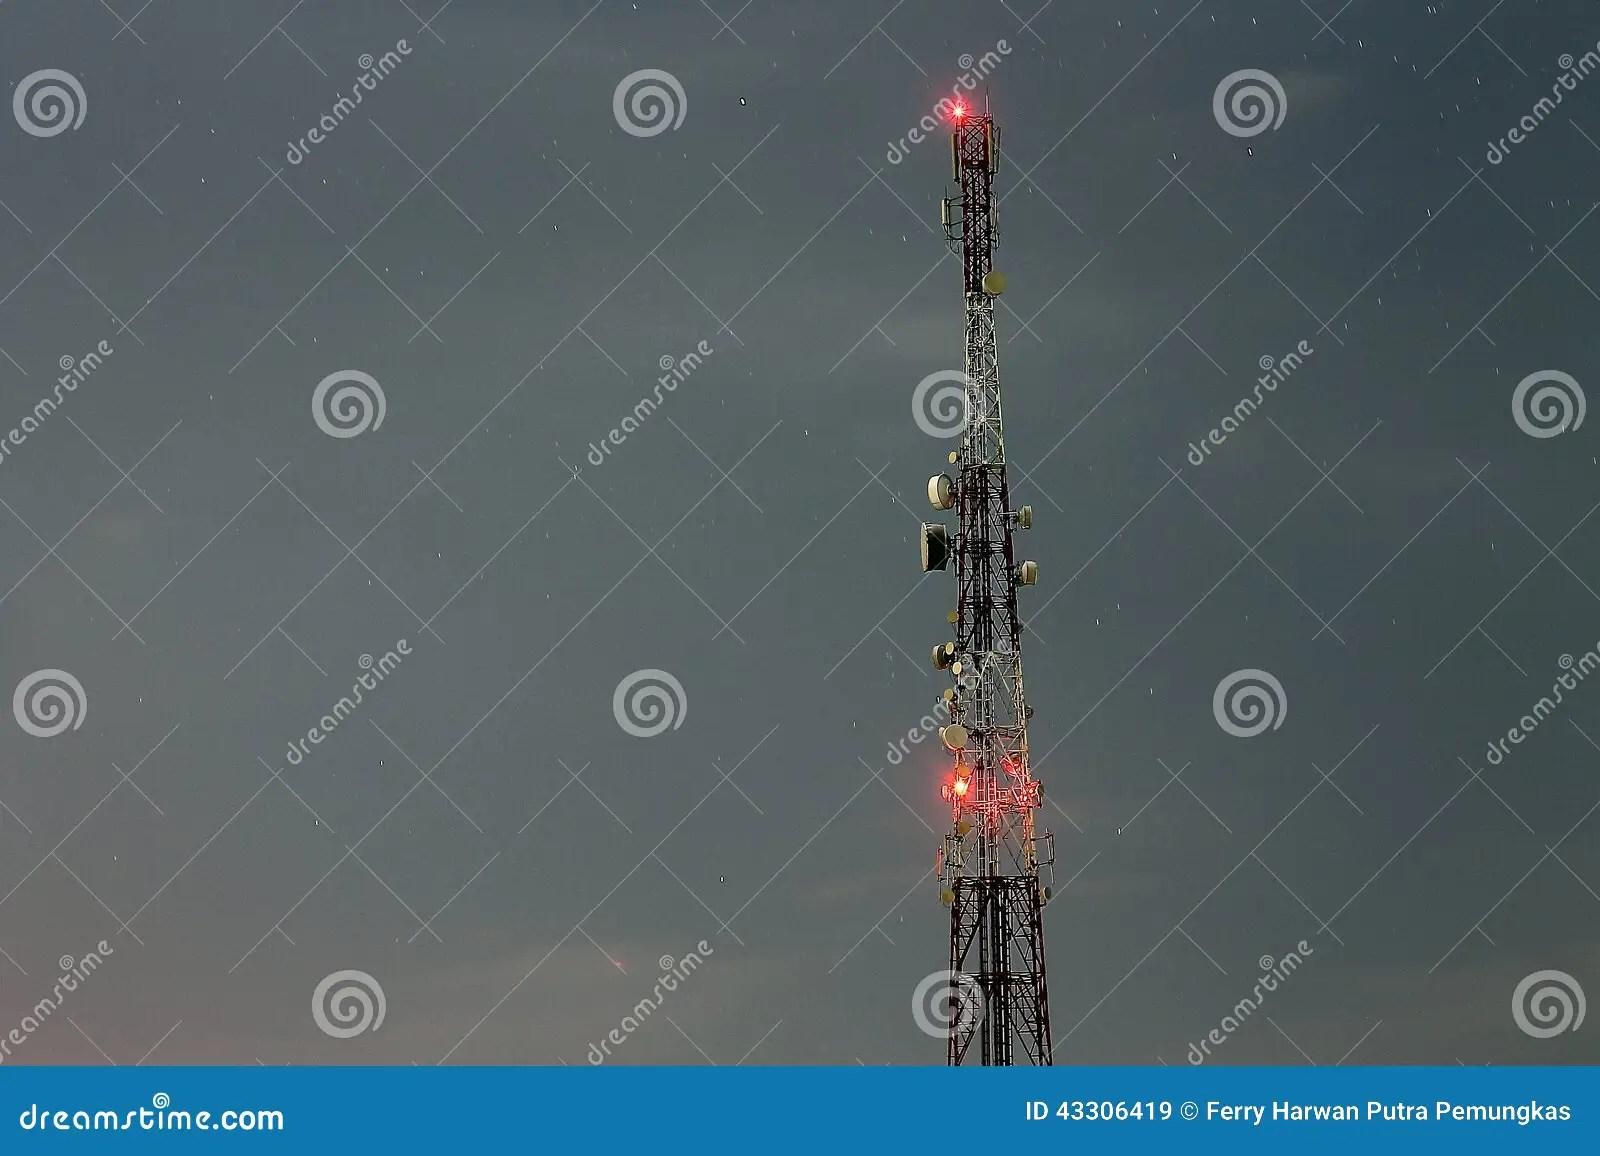 cellular phone tower signal diagram lewis dot for hcn transmitter telecommunication stock photo